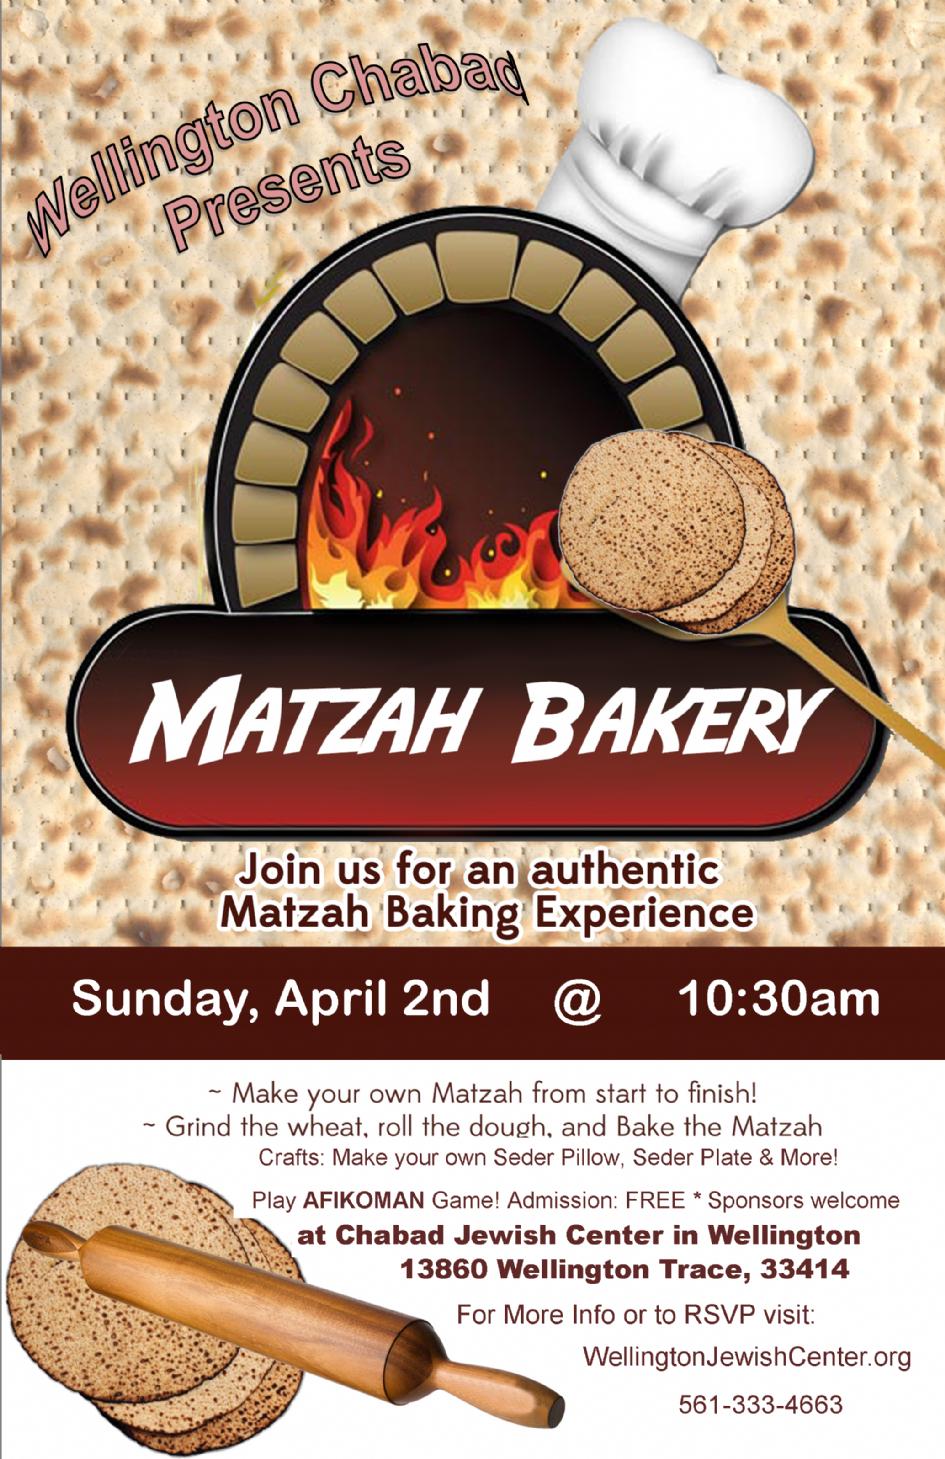 matzah bakery 2017.png